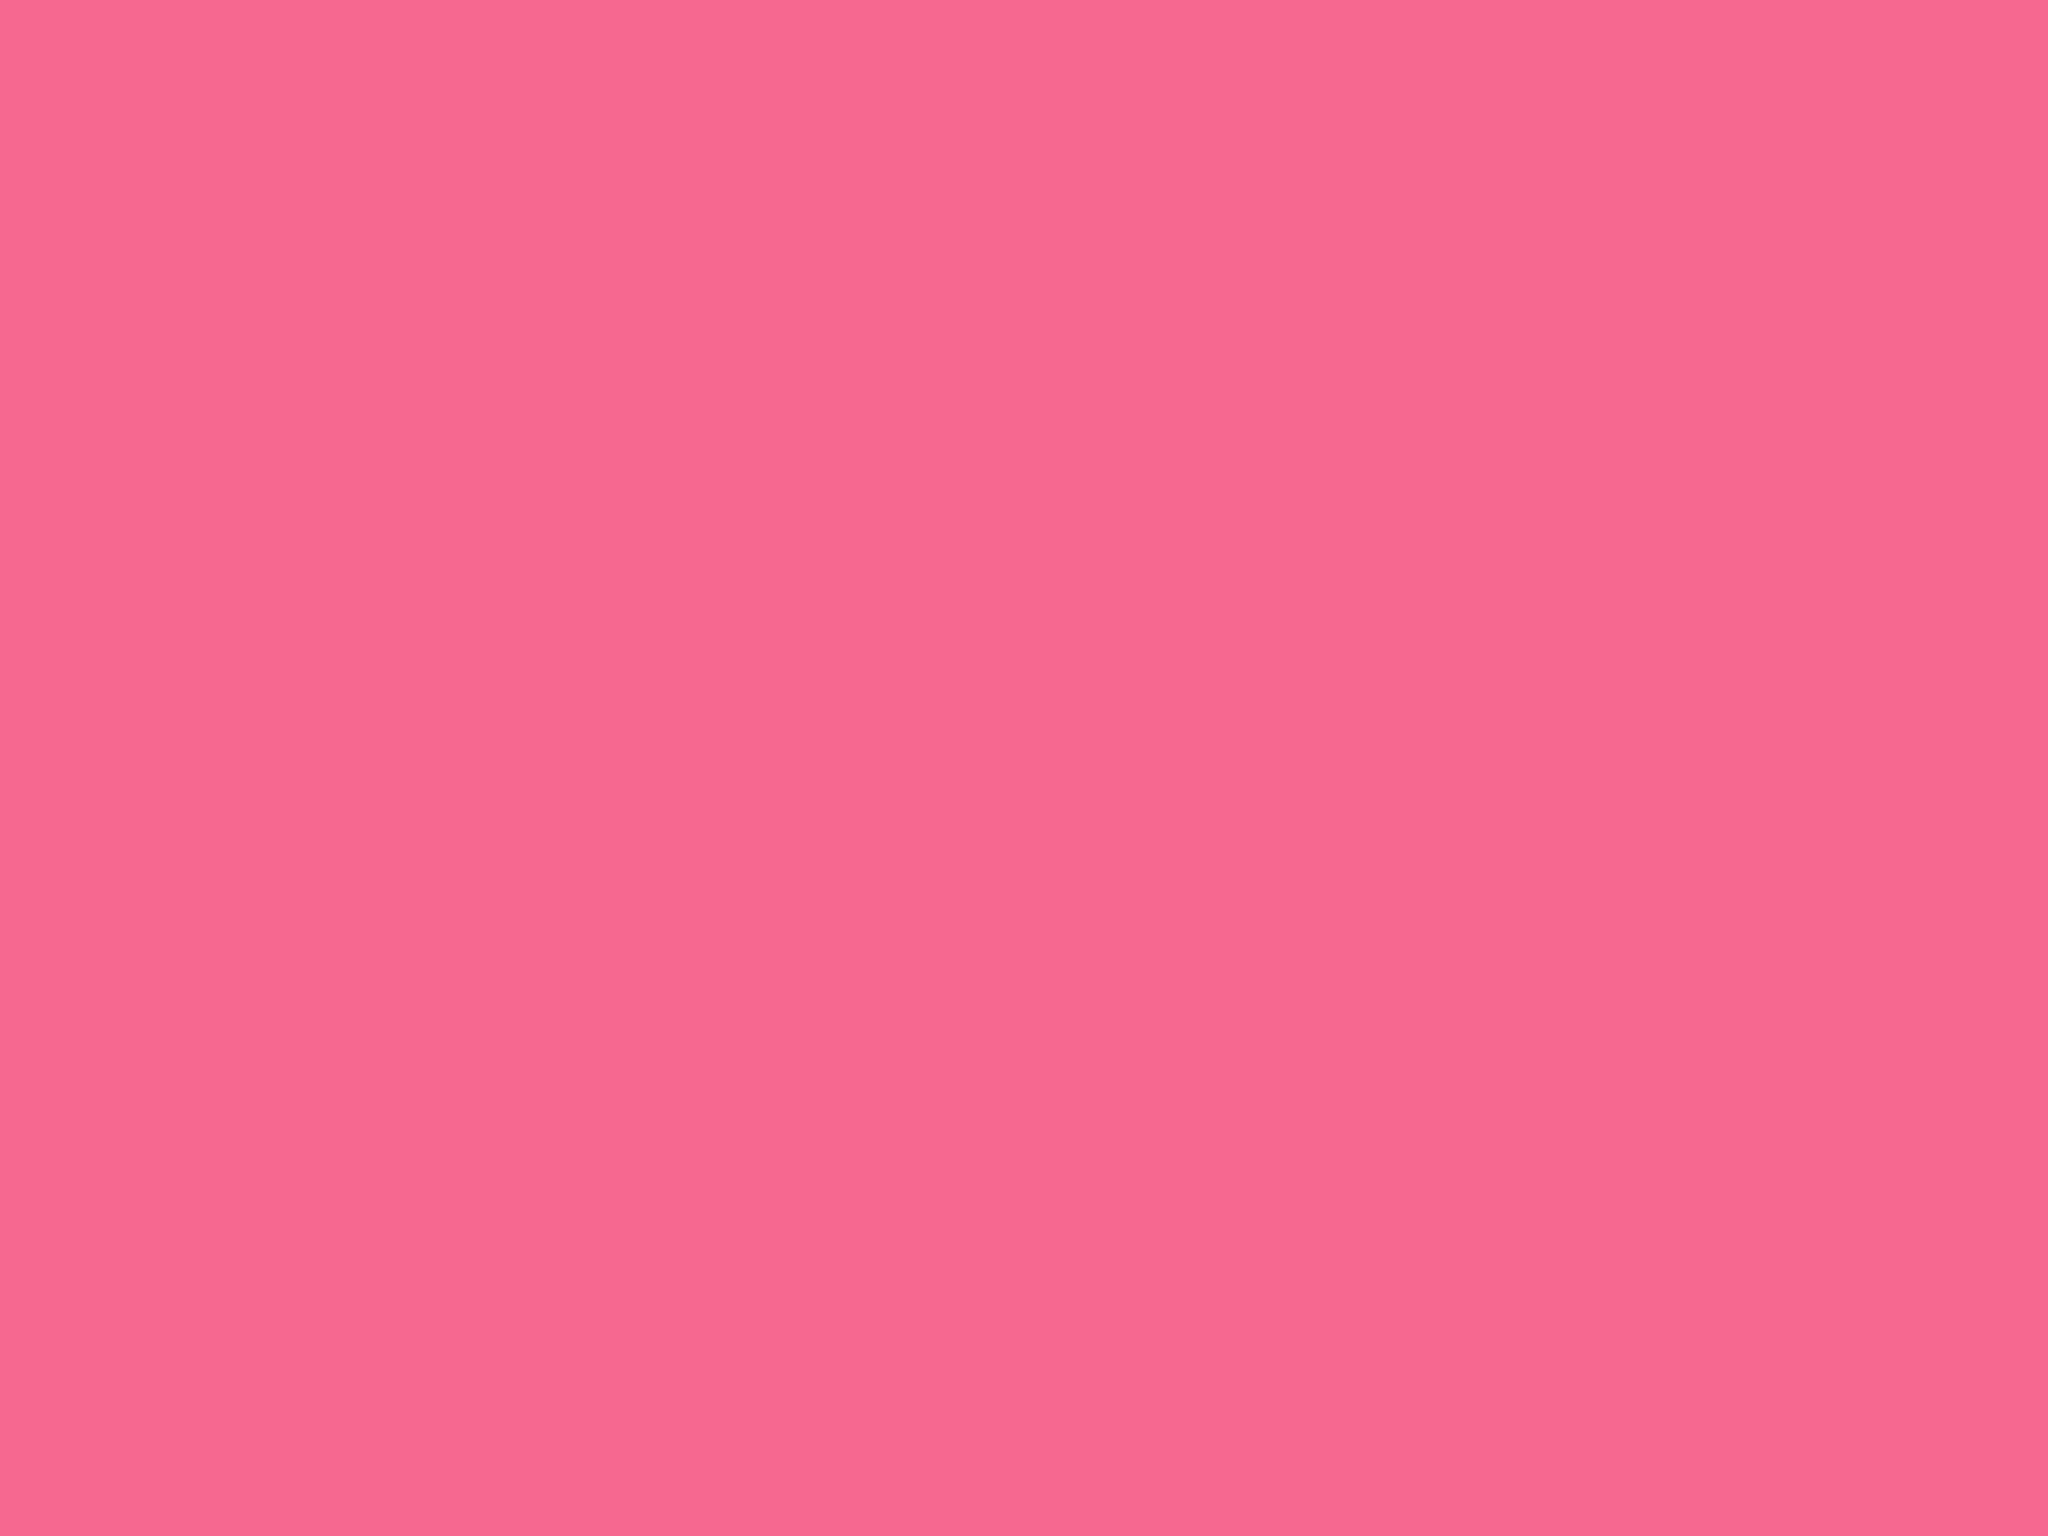 2048x1536 Light Crimson Solid Color Background